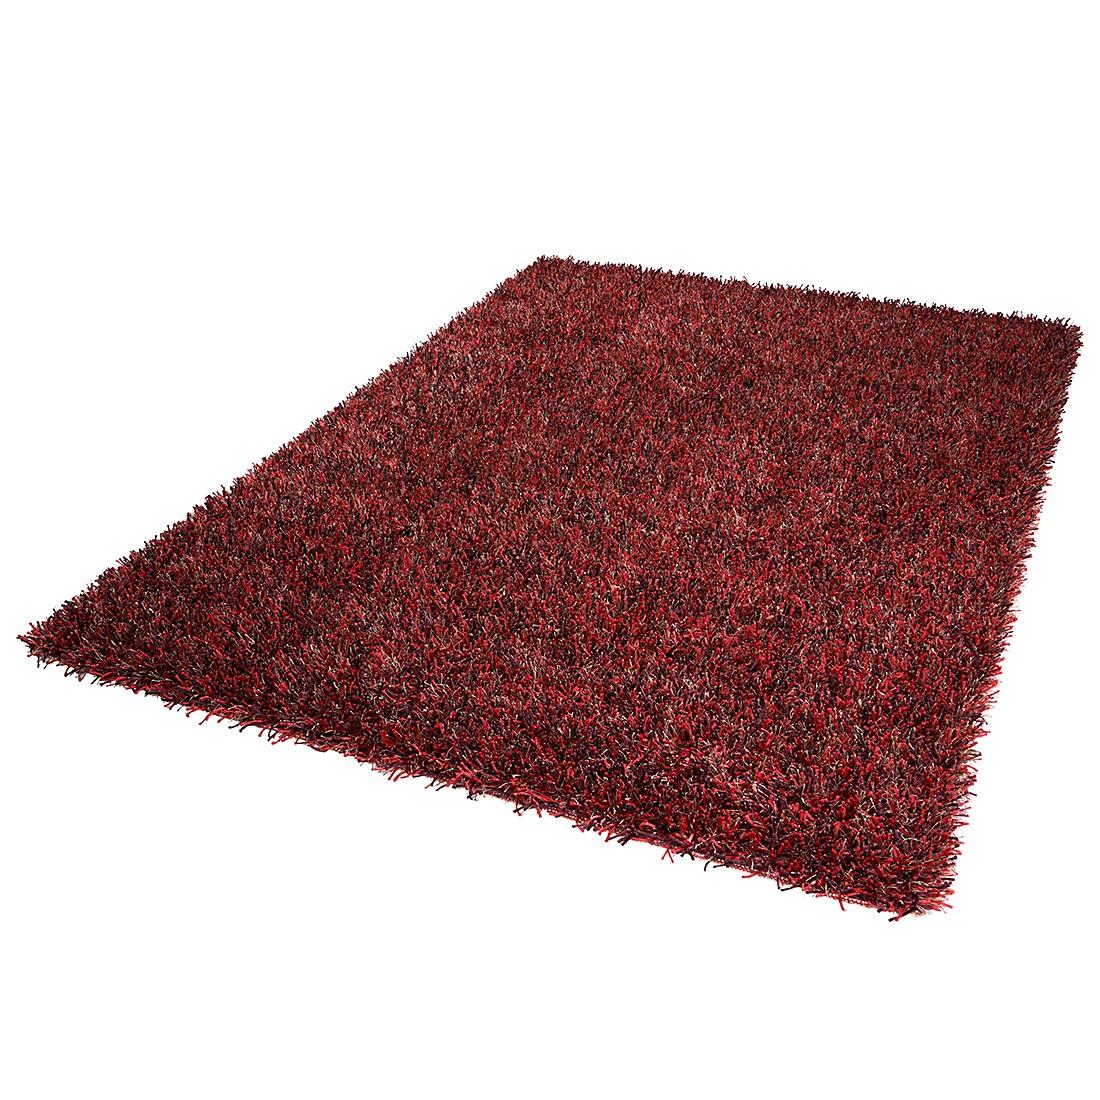 Teppich Corado – Bordeaux – 130 x 190 cm, DEKOWE online kaufen